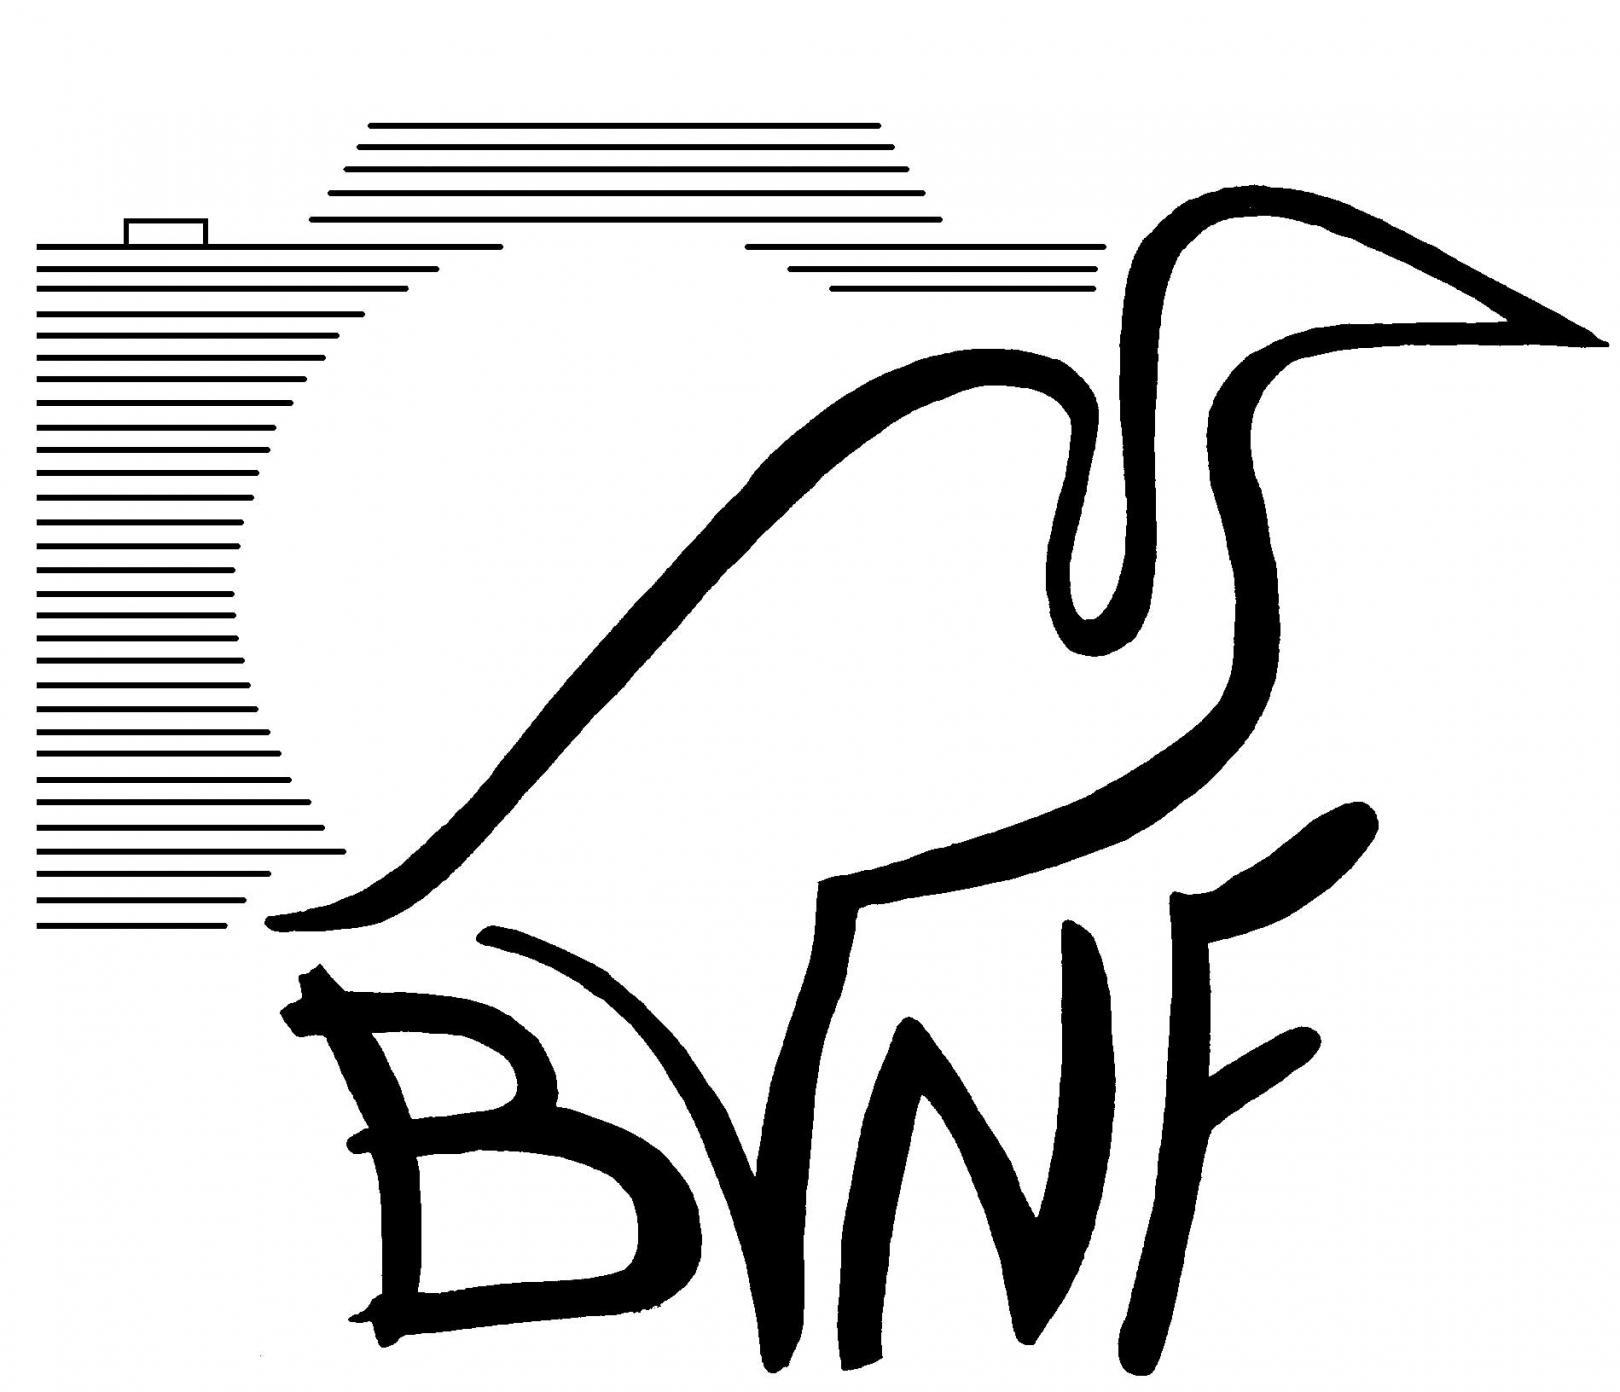 BVNFlogo1899x1632